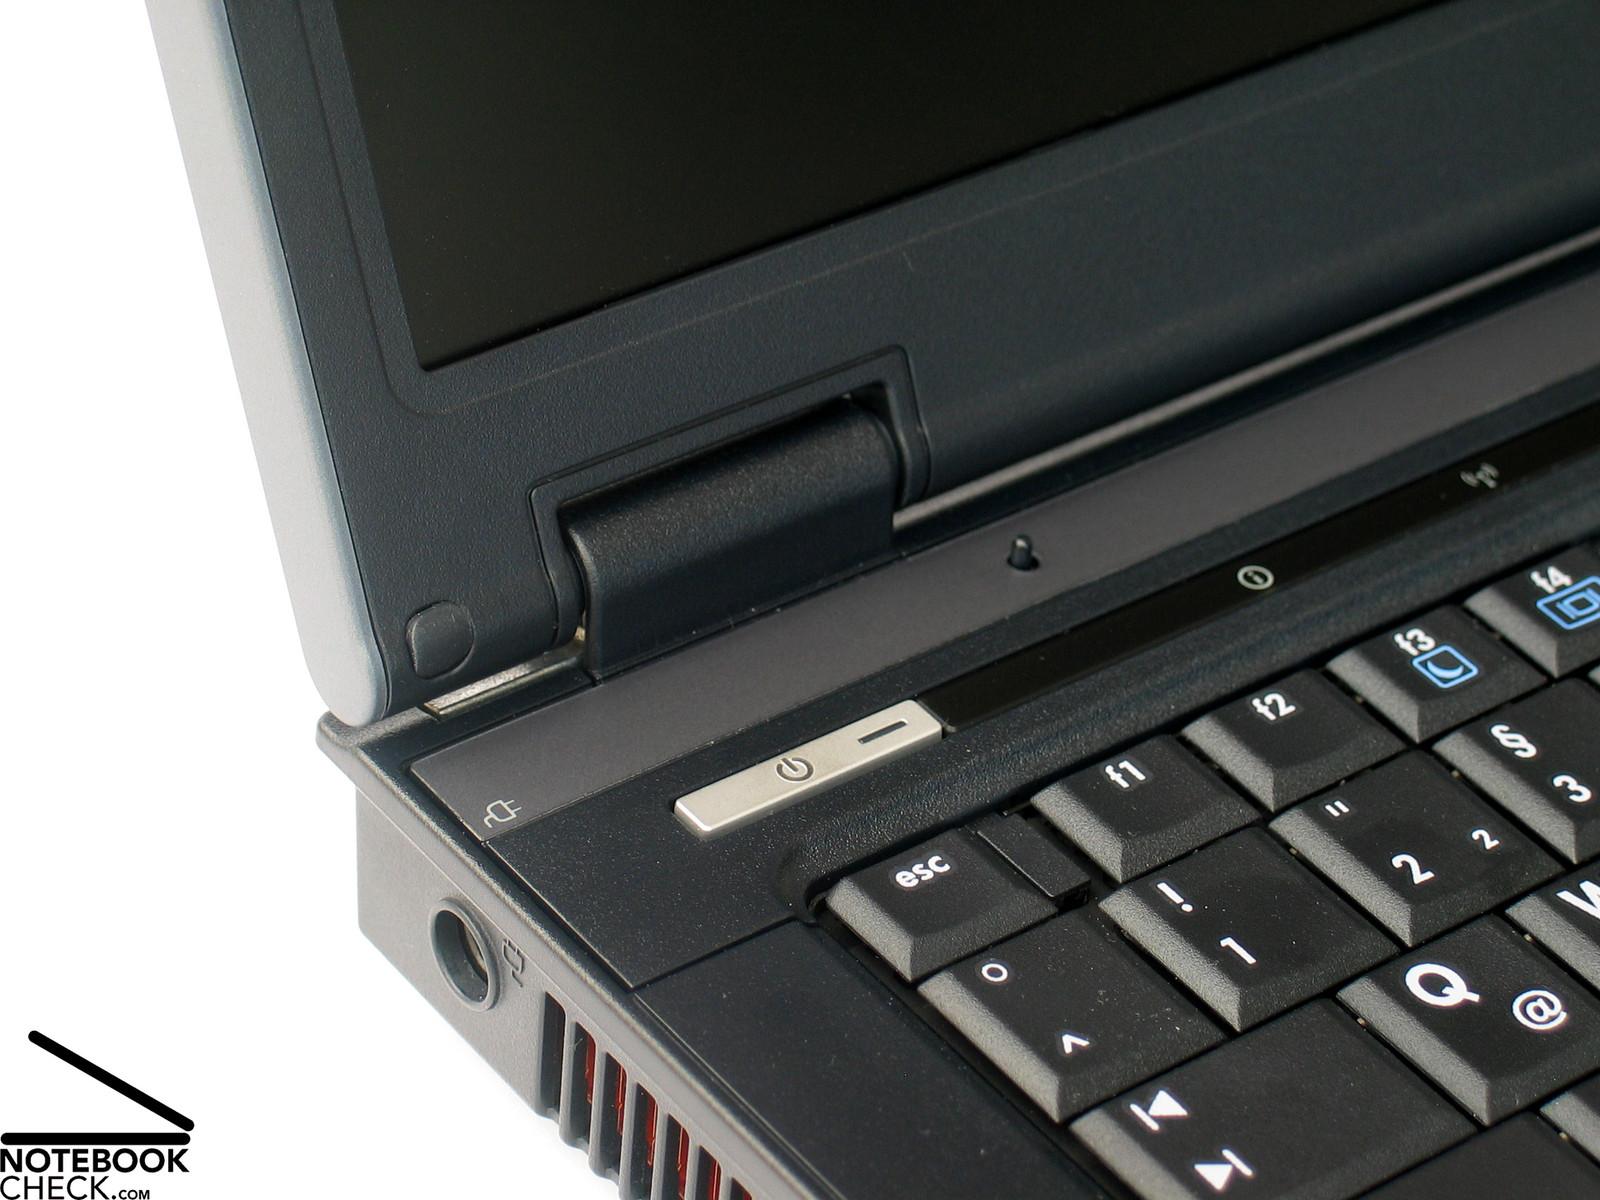 HP Compaq 6710b Image